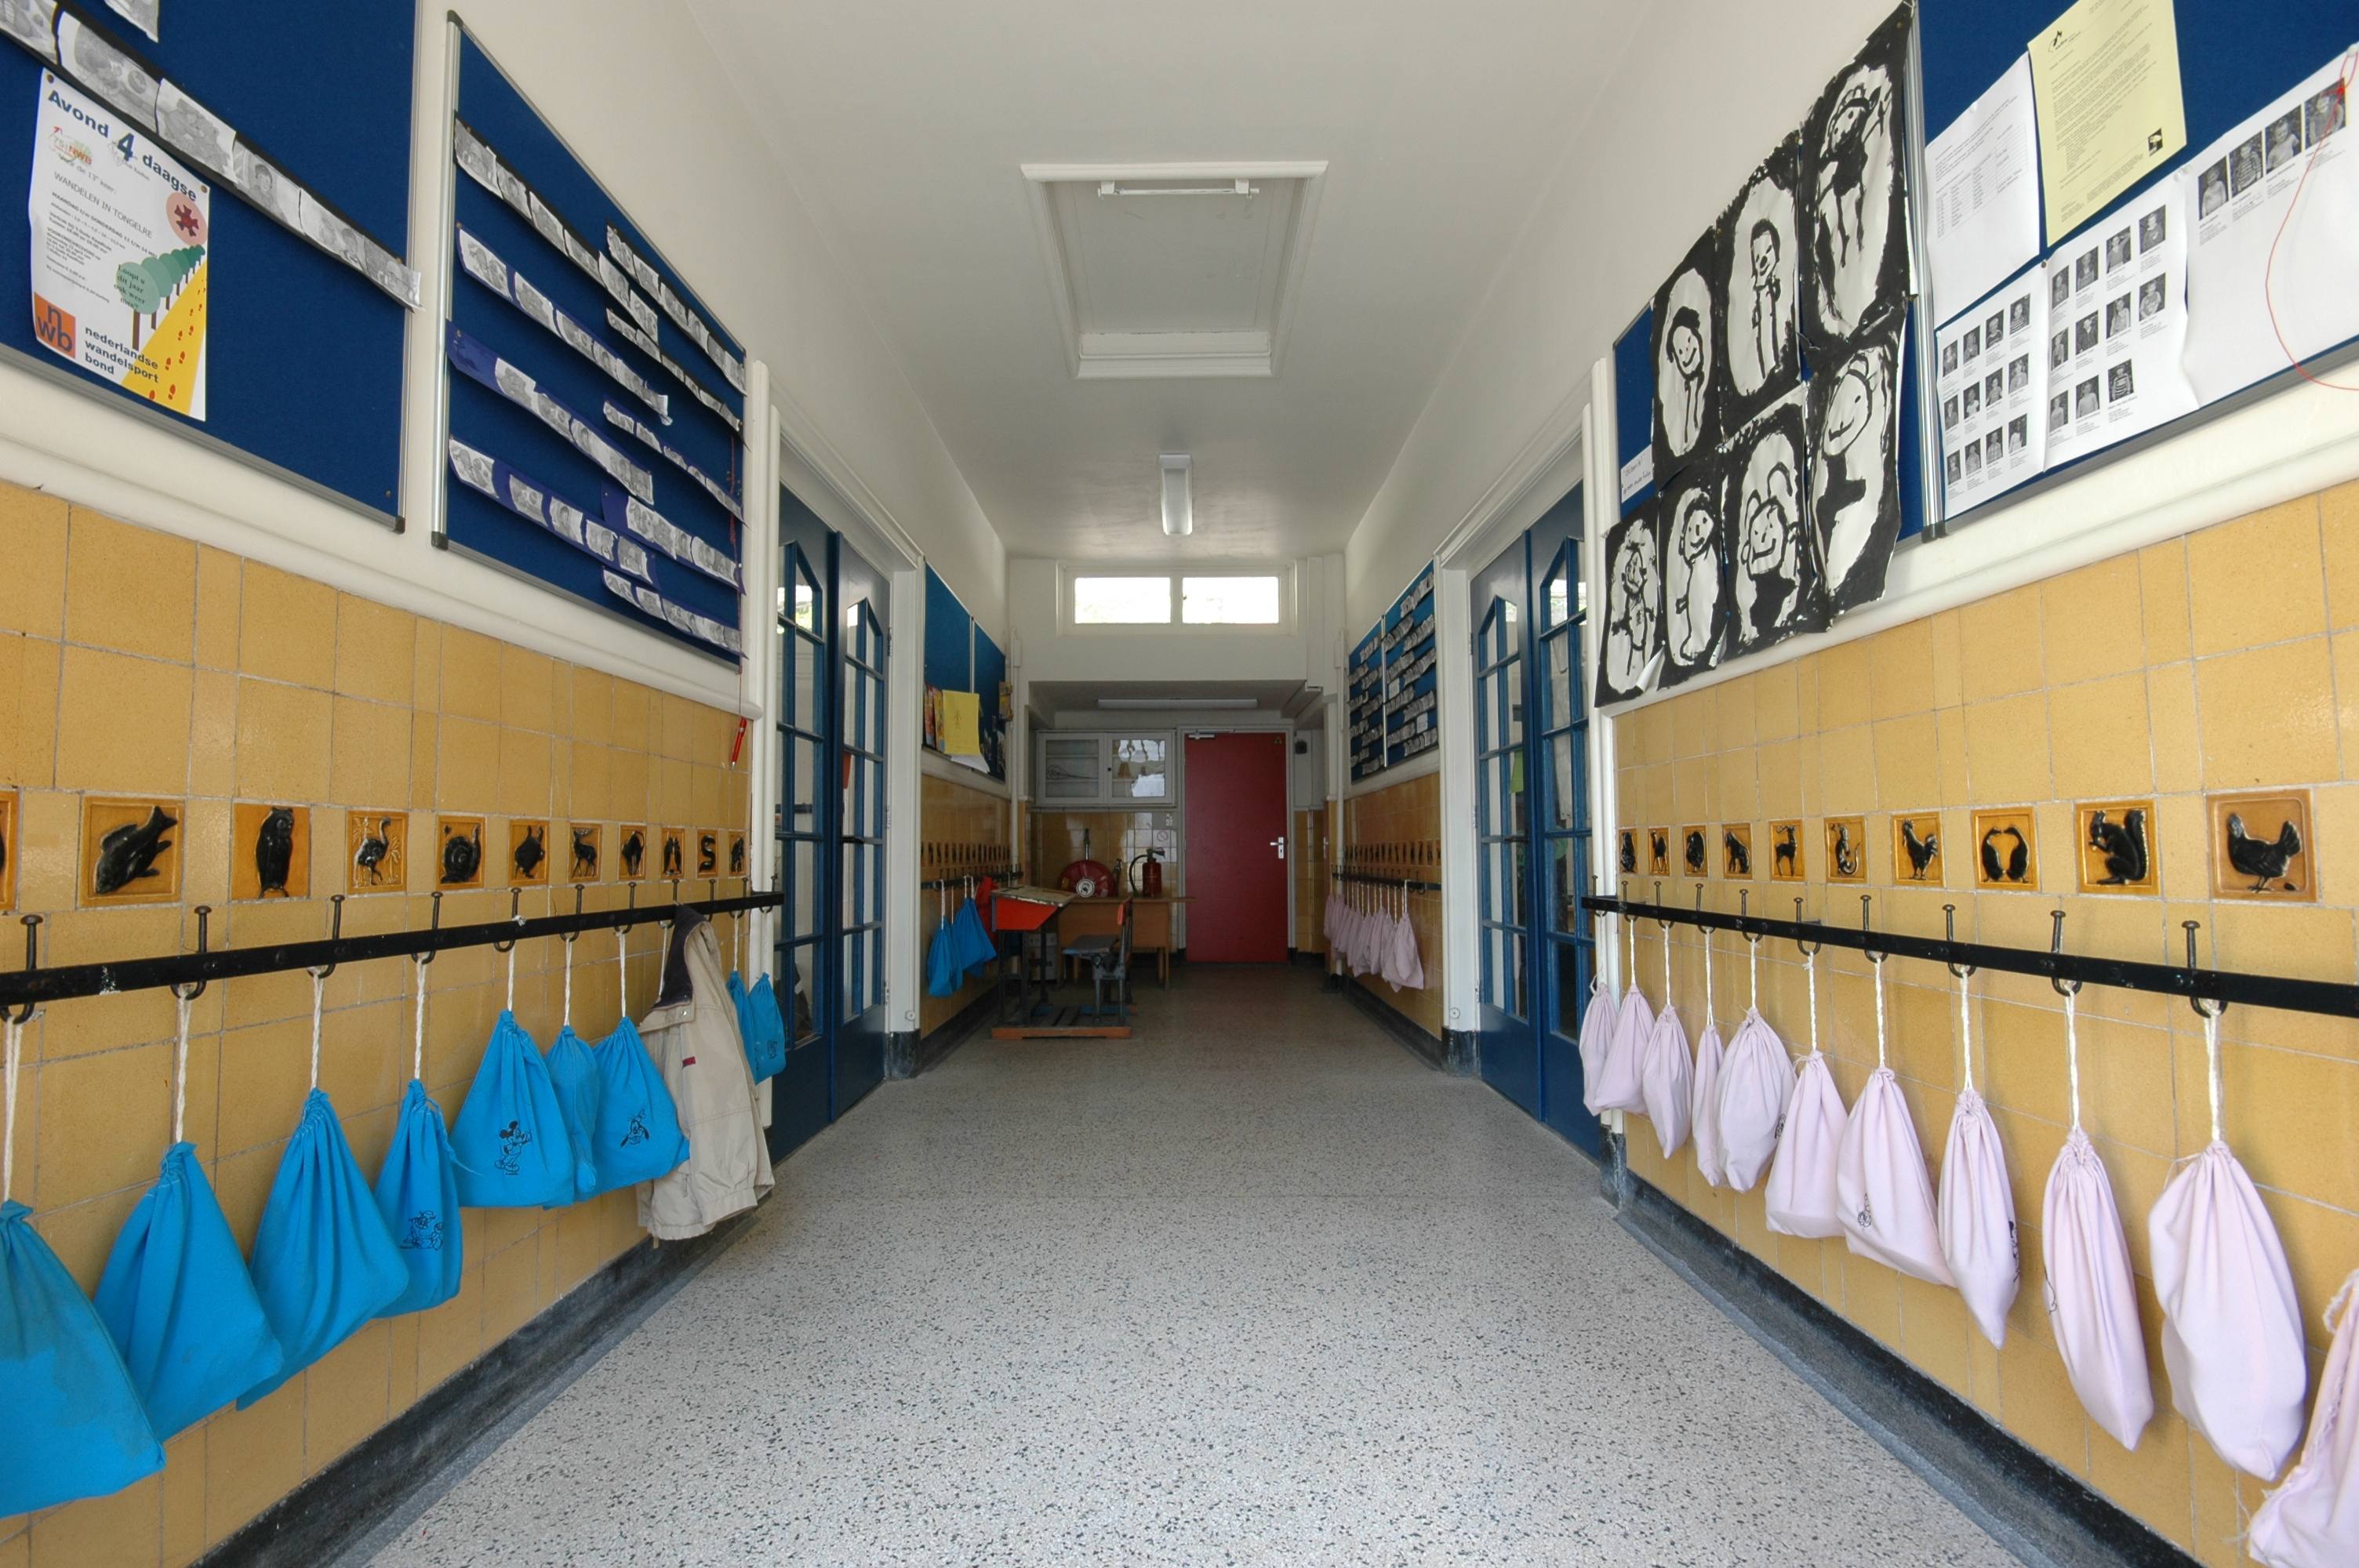 Nutskleuterschool fr belschool onderdeel van basisschool reigerlaan in eindhoven monument - Een gang ...